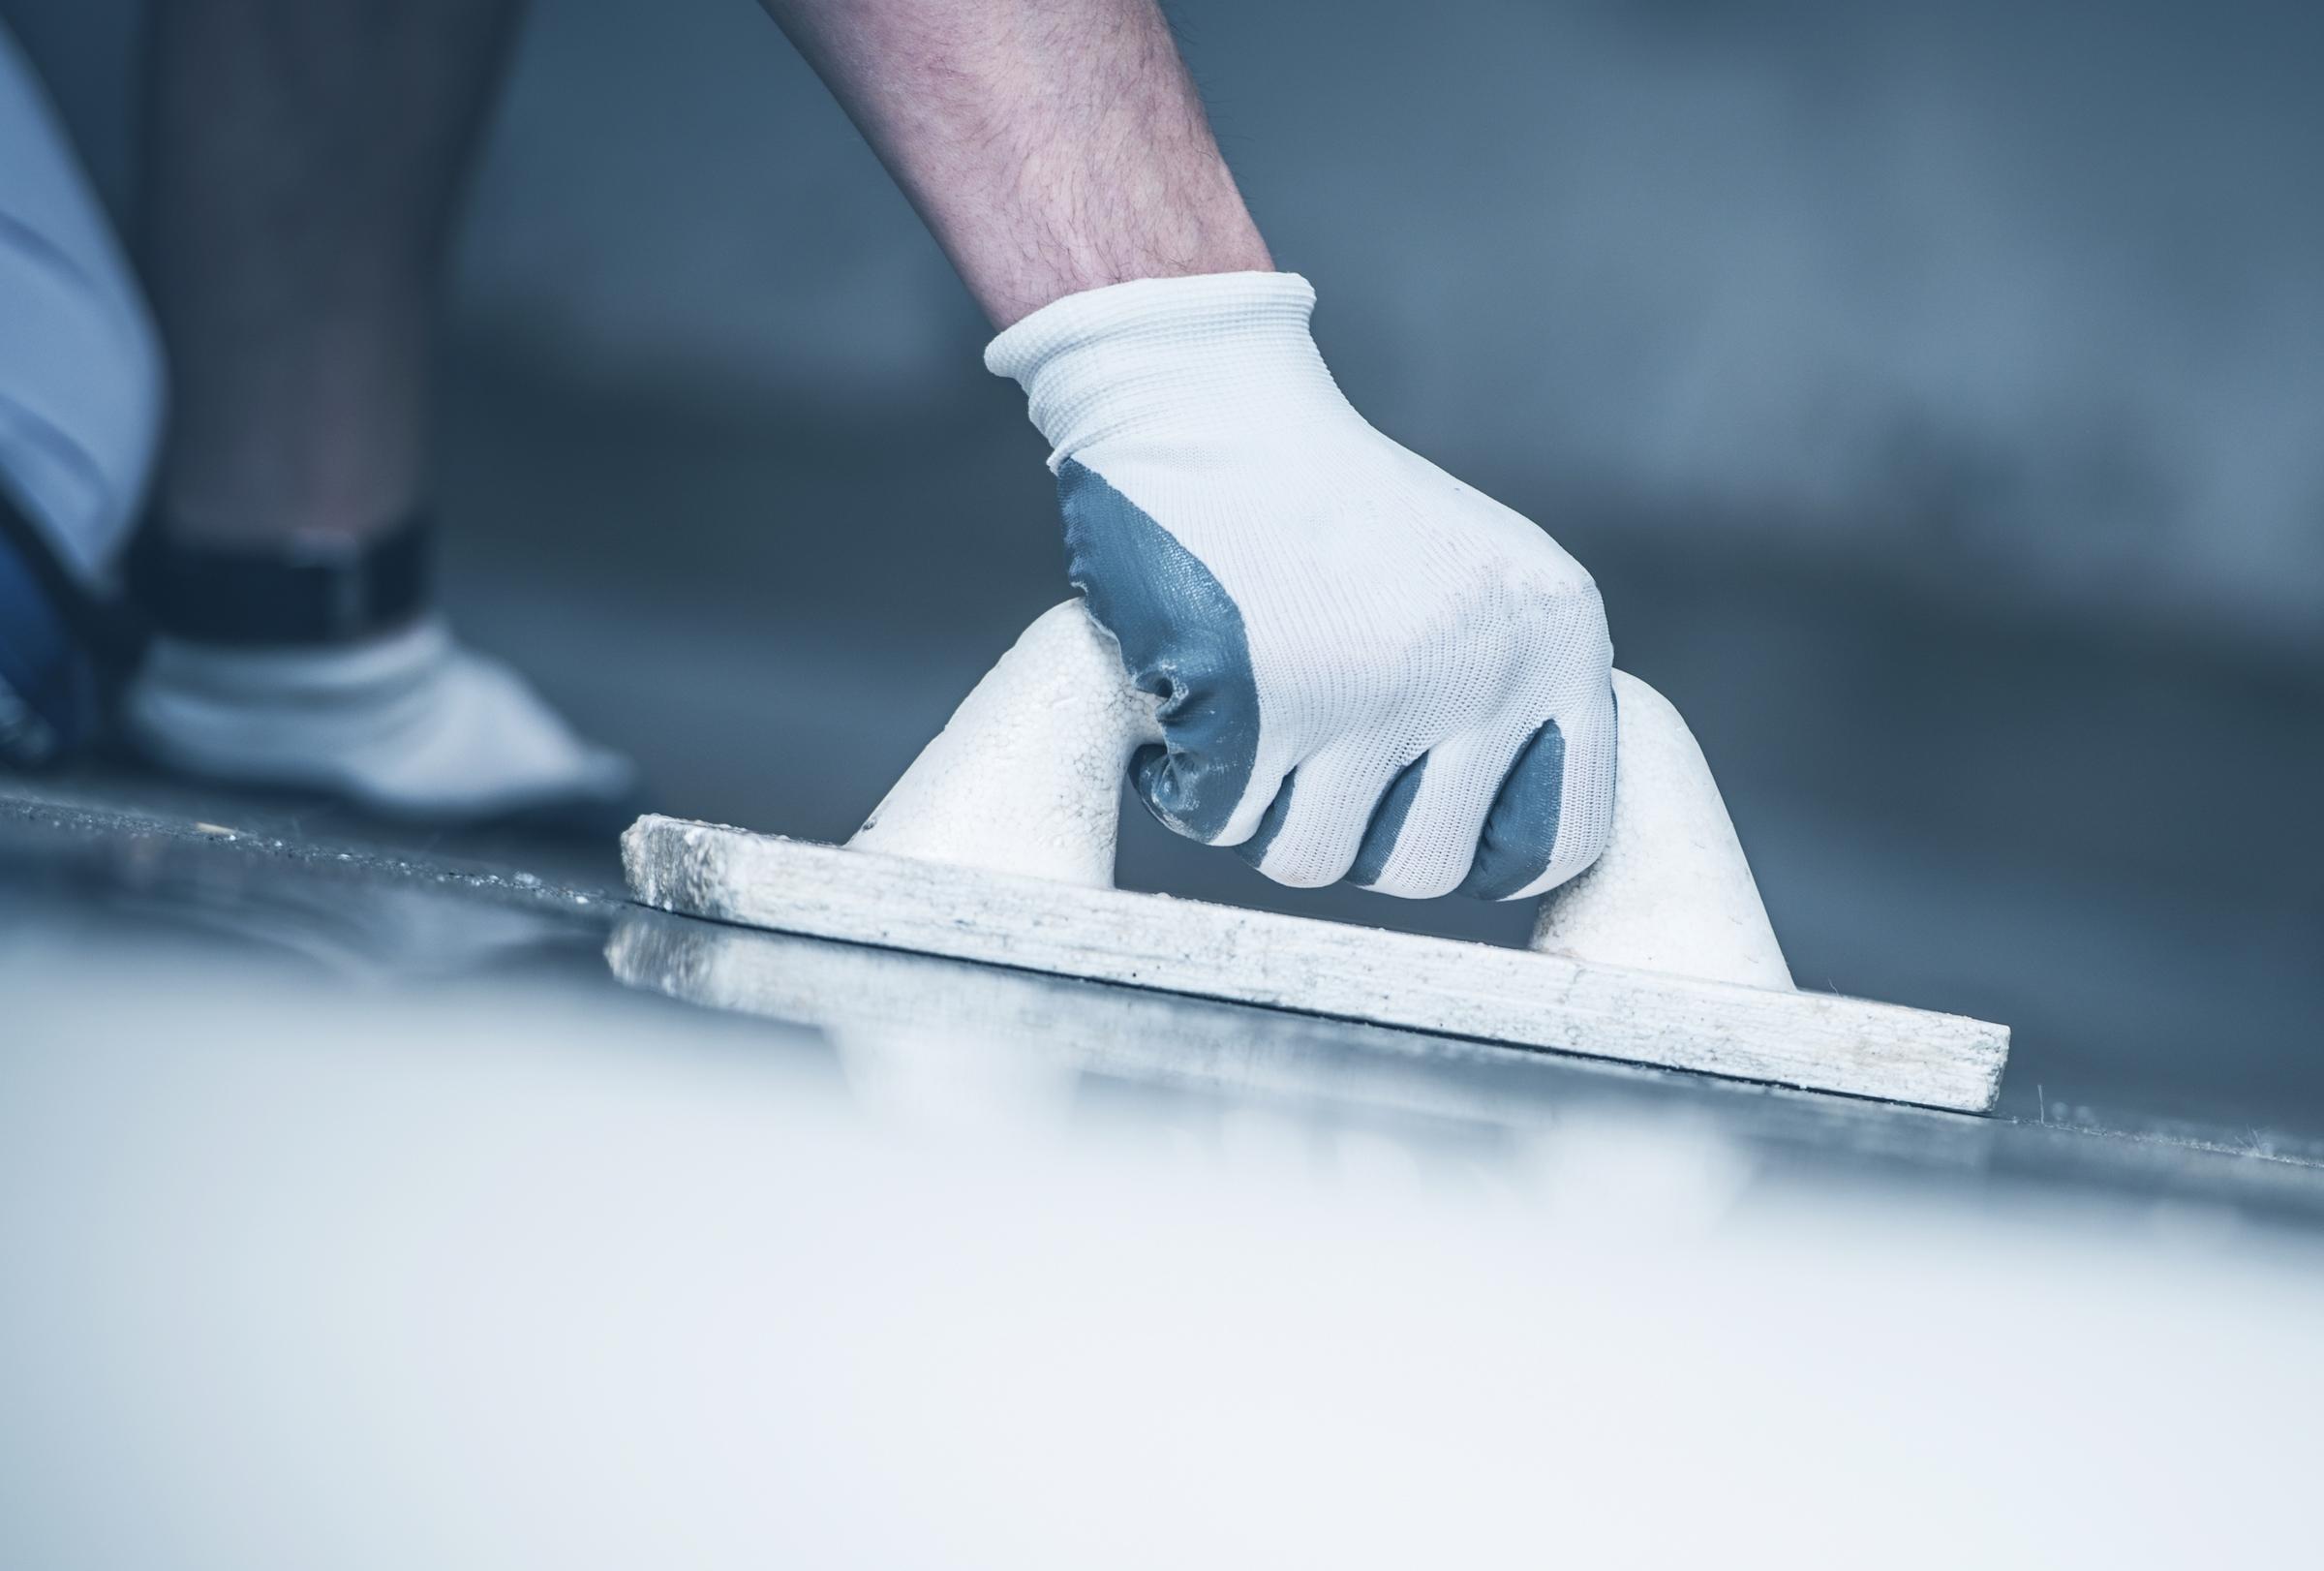 finishing concrete floor PJE3TFA